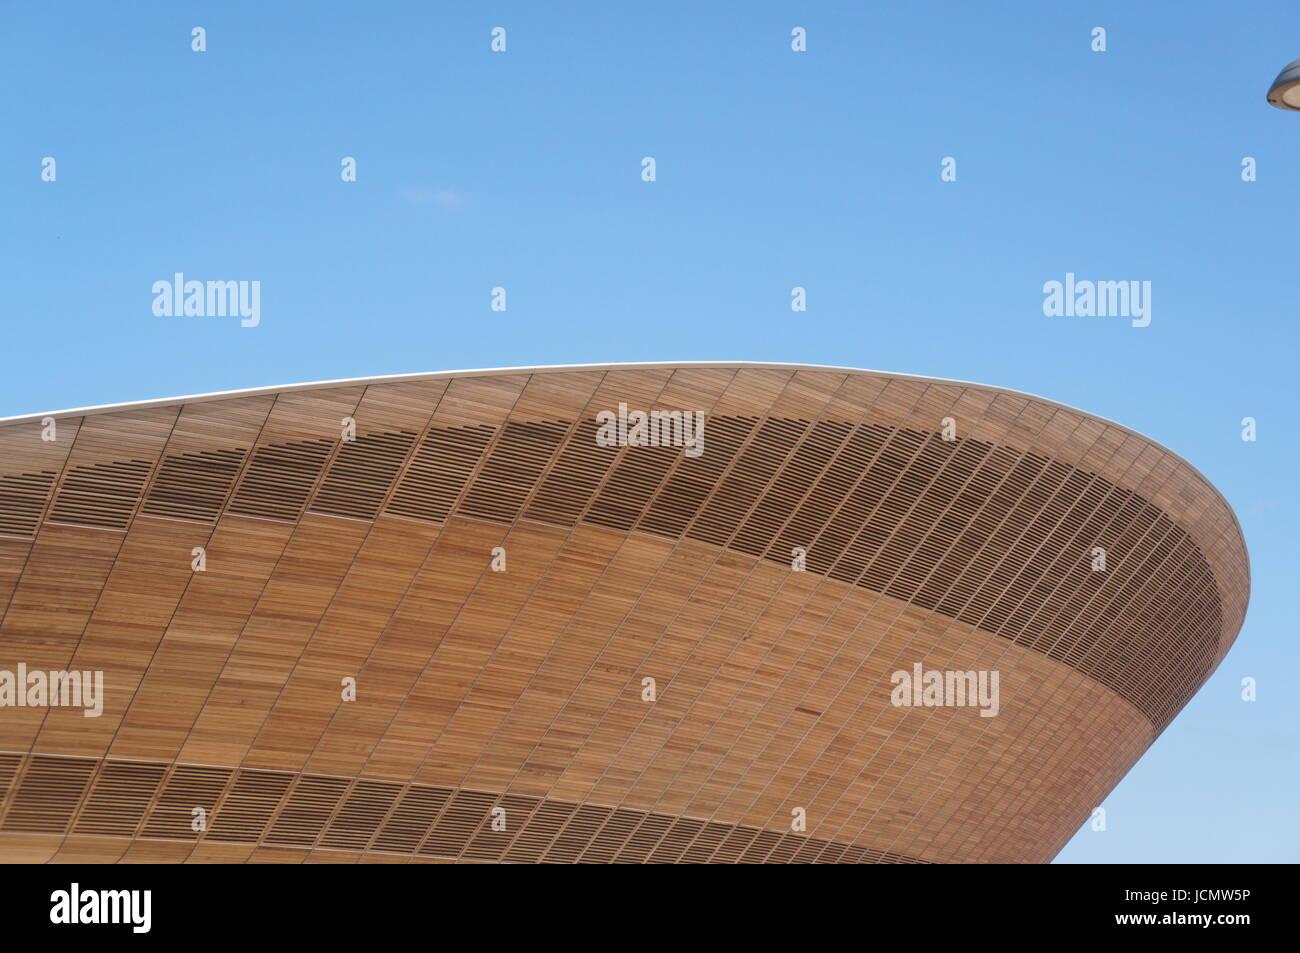 Hopkins Velodrome 2012 London Olympics - Stock Image